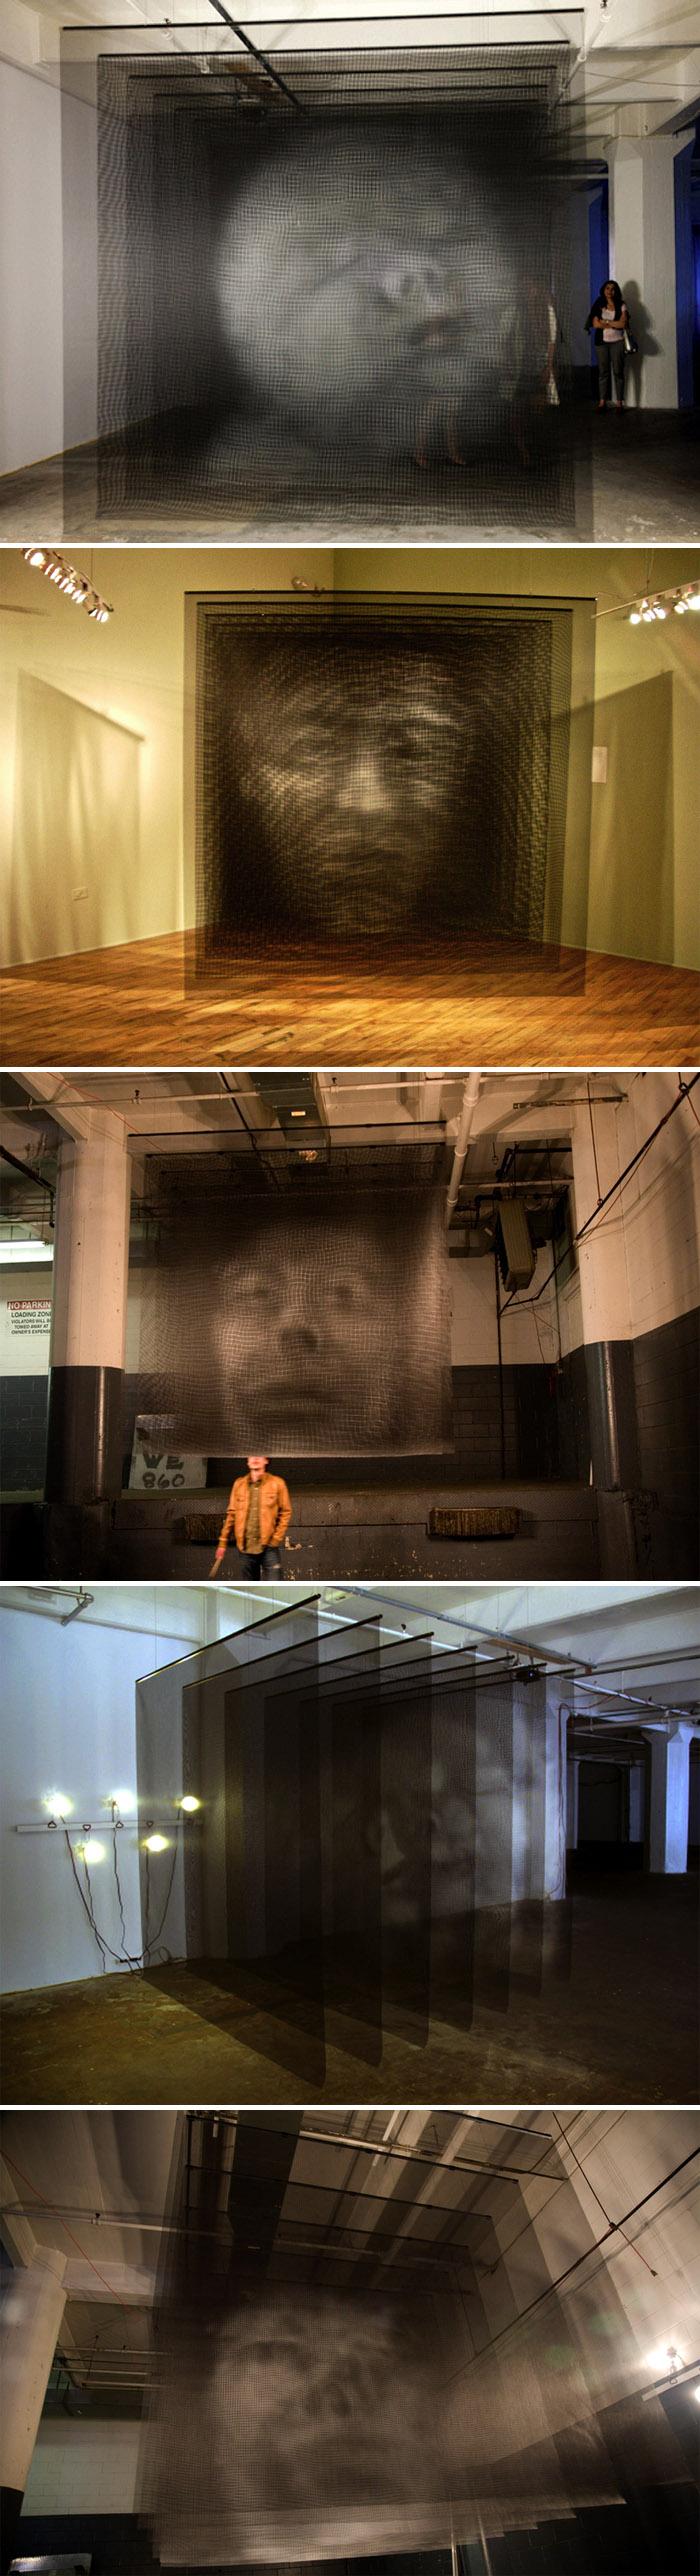 Sculpture, multi-screen, multi-dimensional heads, mesh sheets, Brooklyn artist